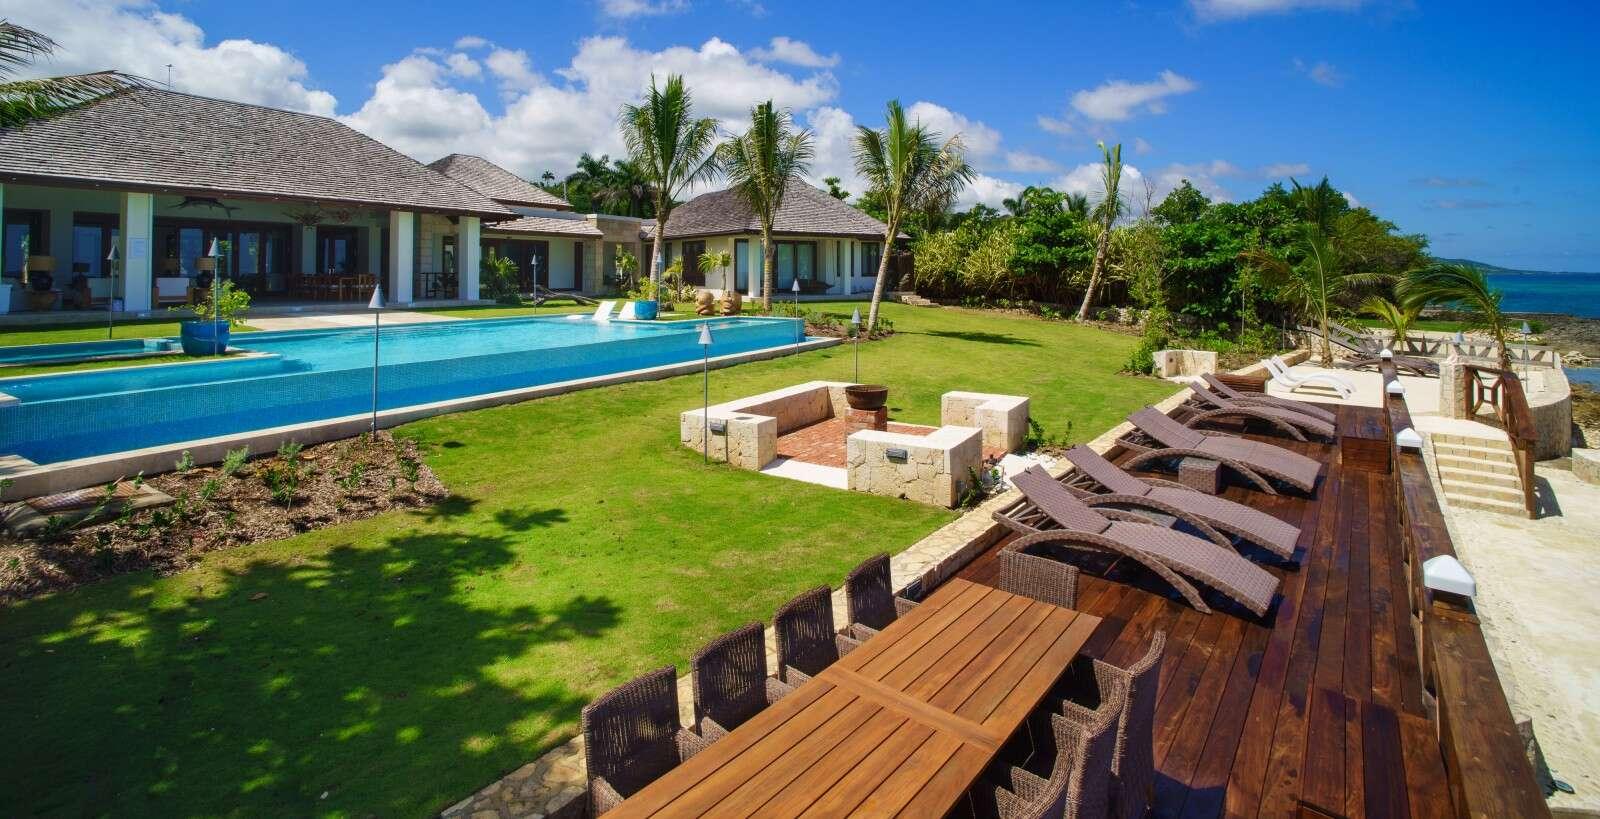 Luxury villa rentals caribbean - Jamaica - Try all club - No location 4 - Aqua Bay - Image 1/22